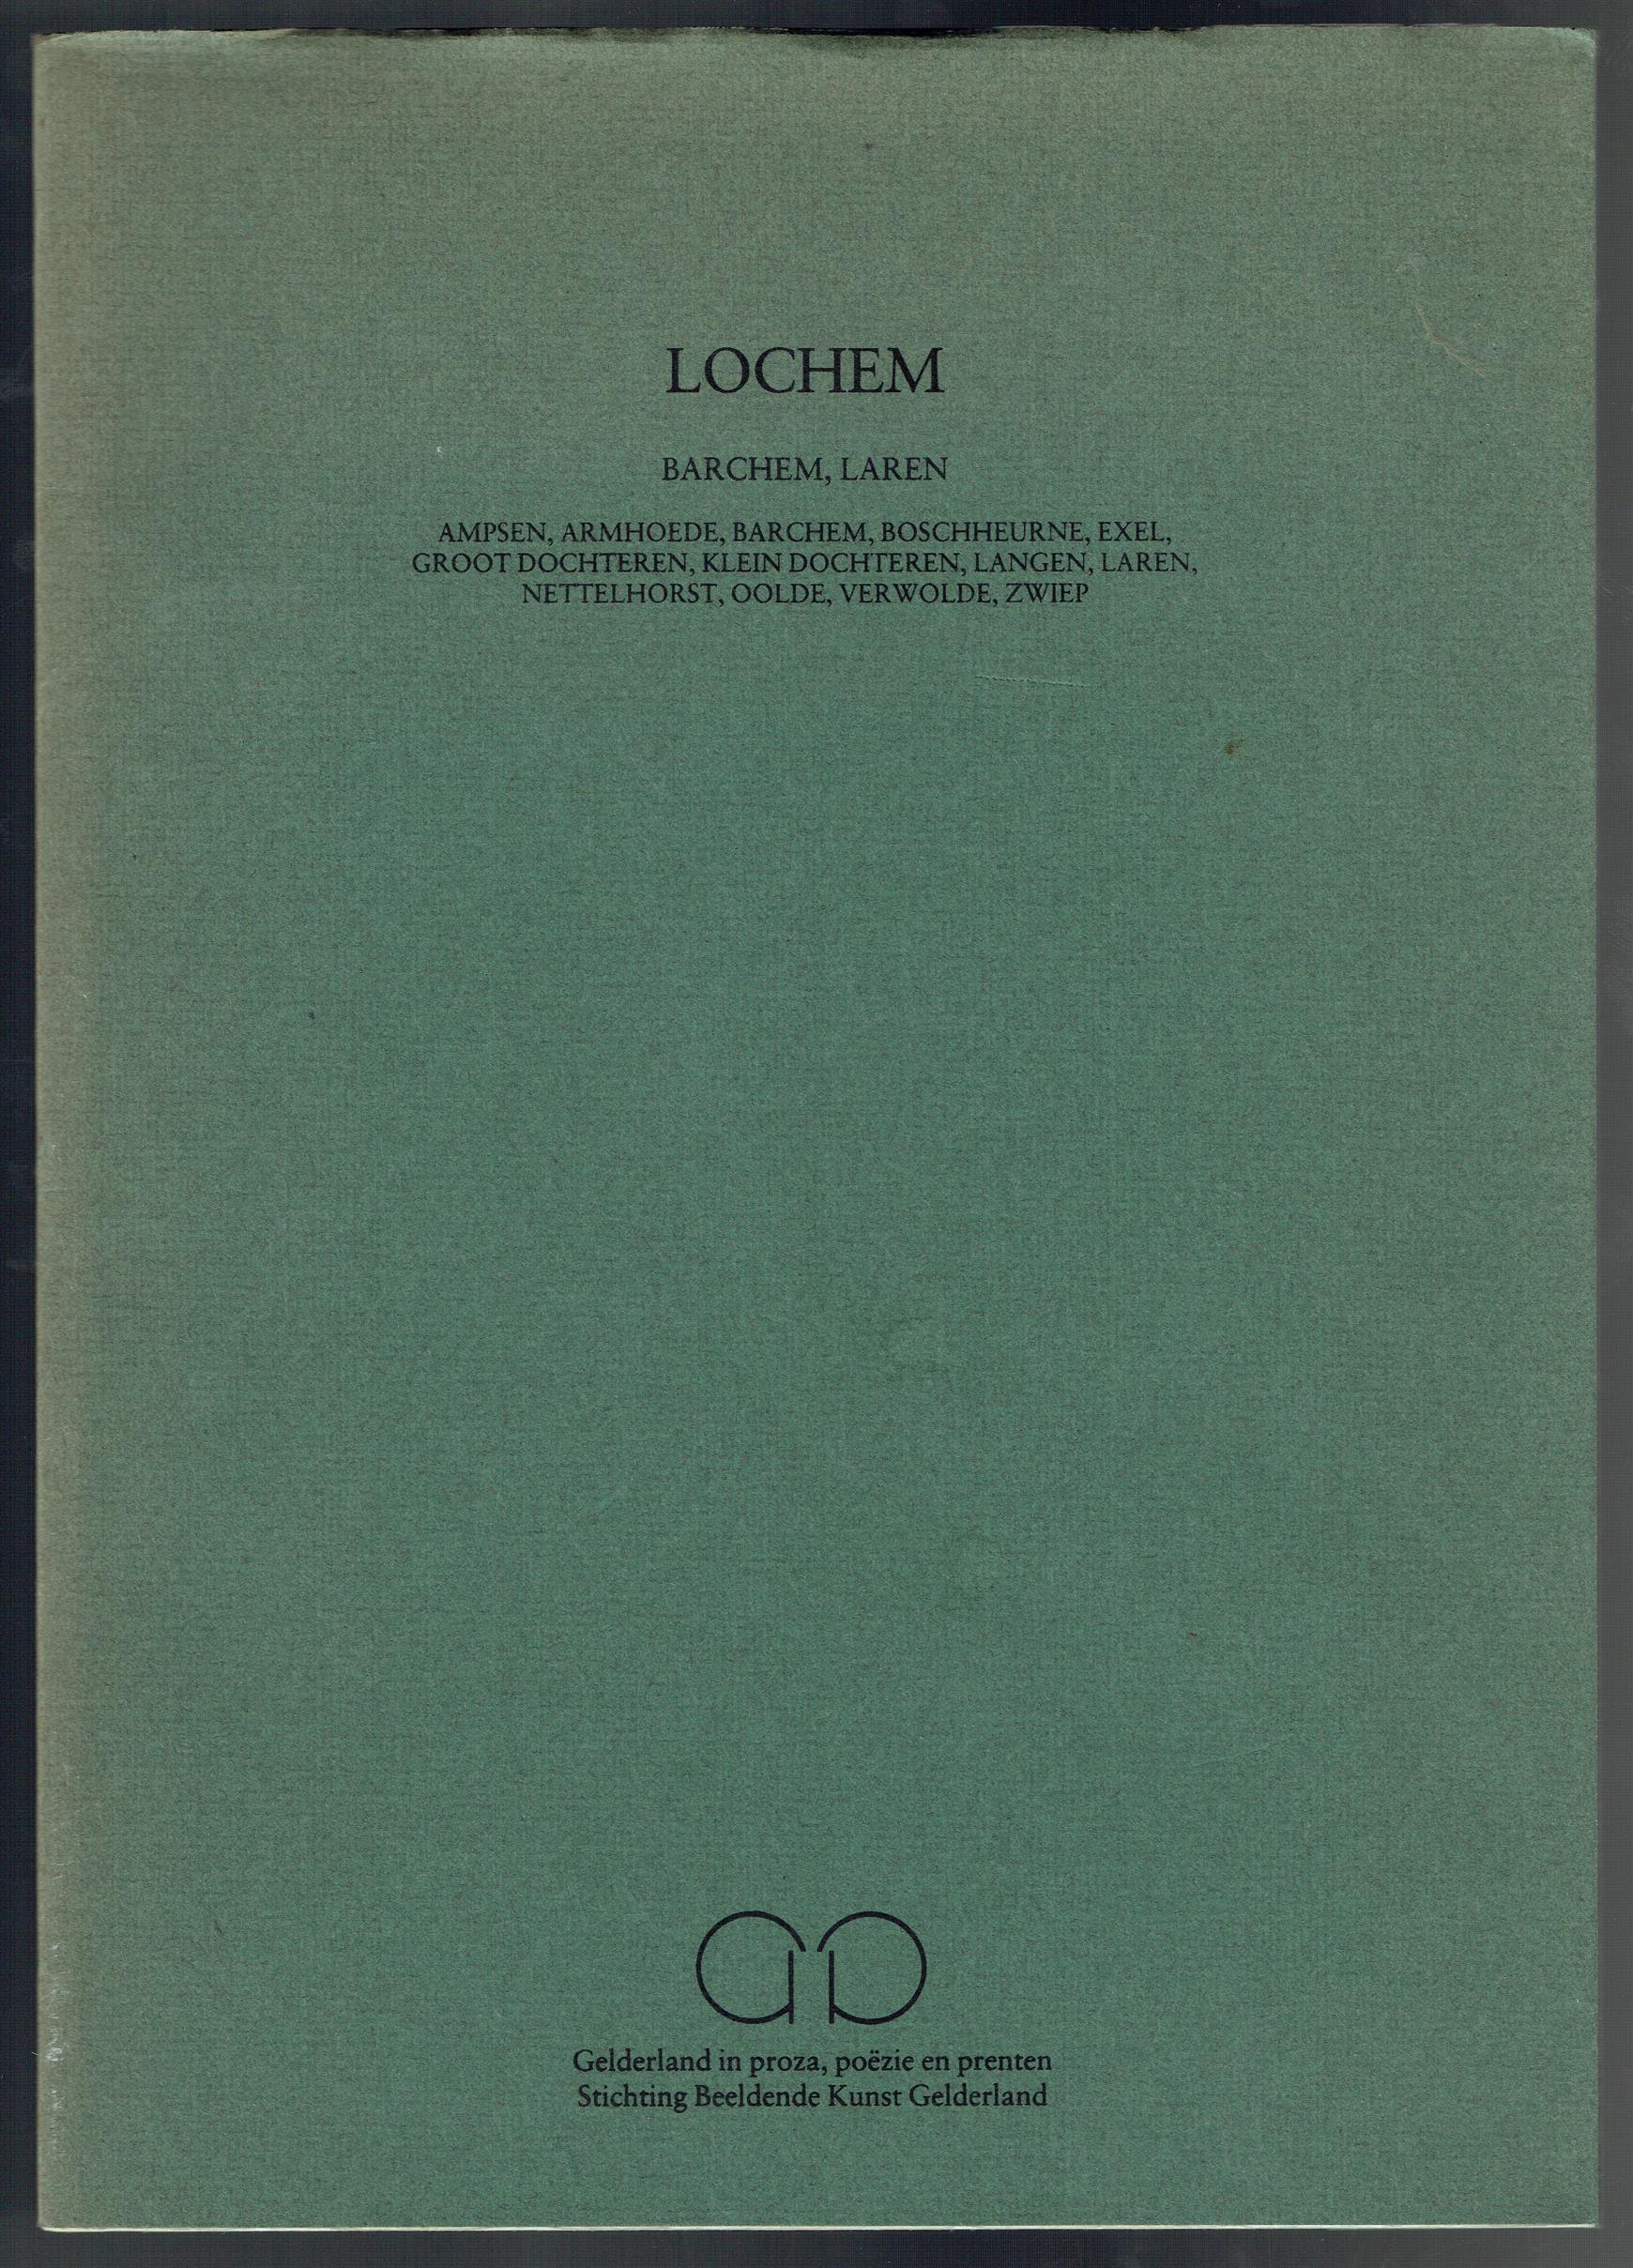 DAAN, JO (JOHANNA CATHARINA), 1910-2006. - Lochem, Barchem, Laren: Ampsen, Armhoede, Barchem, Boschheurne, Exel, Groot Dochteren, Klein Dochteren, Langen, Laren, Nettelhorst, Oolde, Verwolde, Zwiep